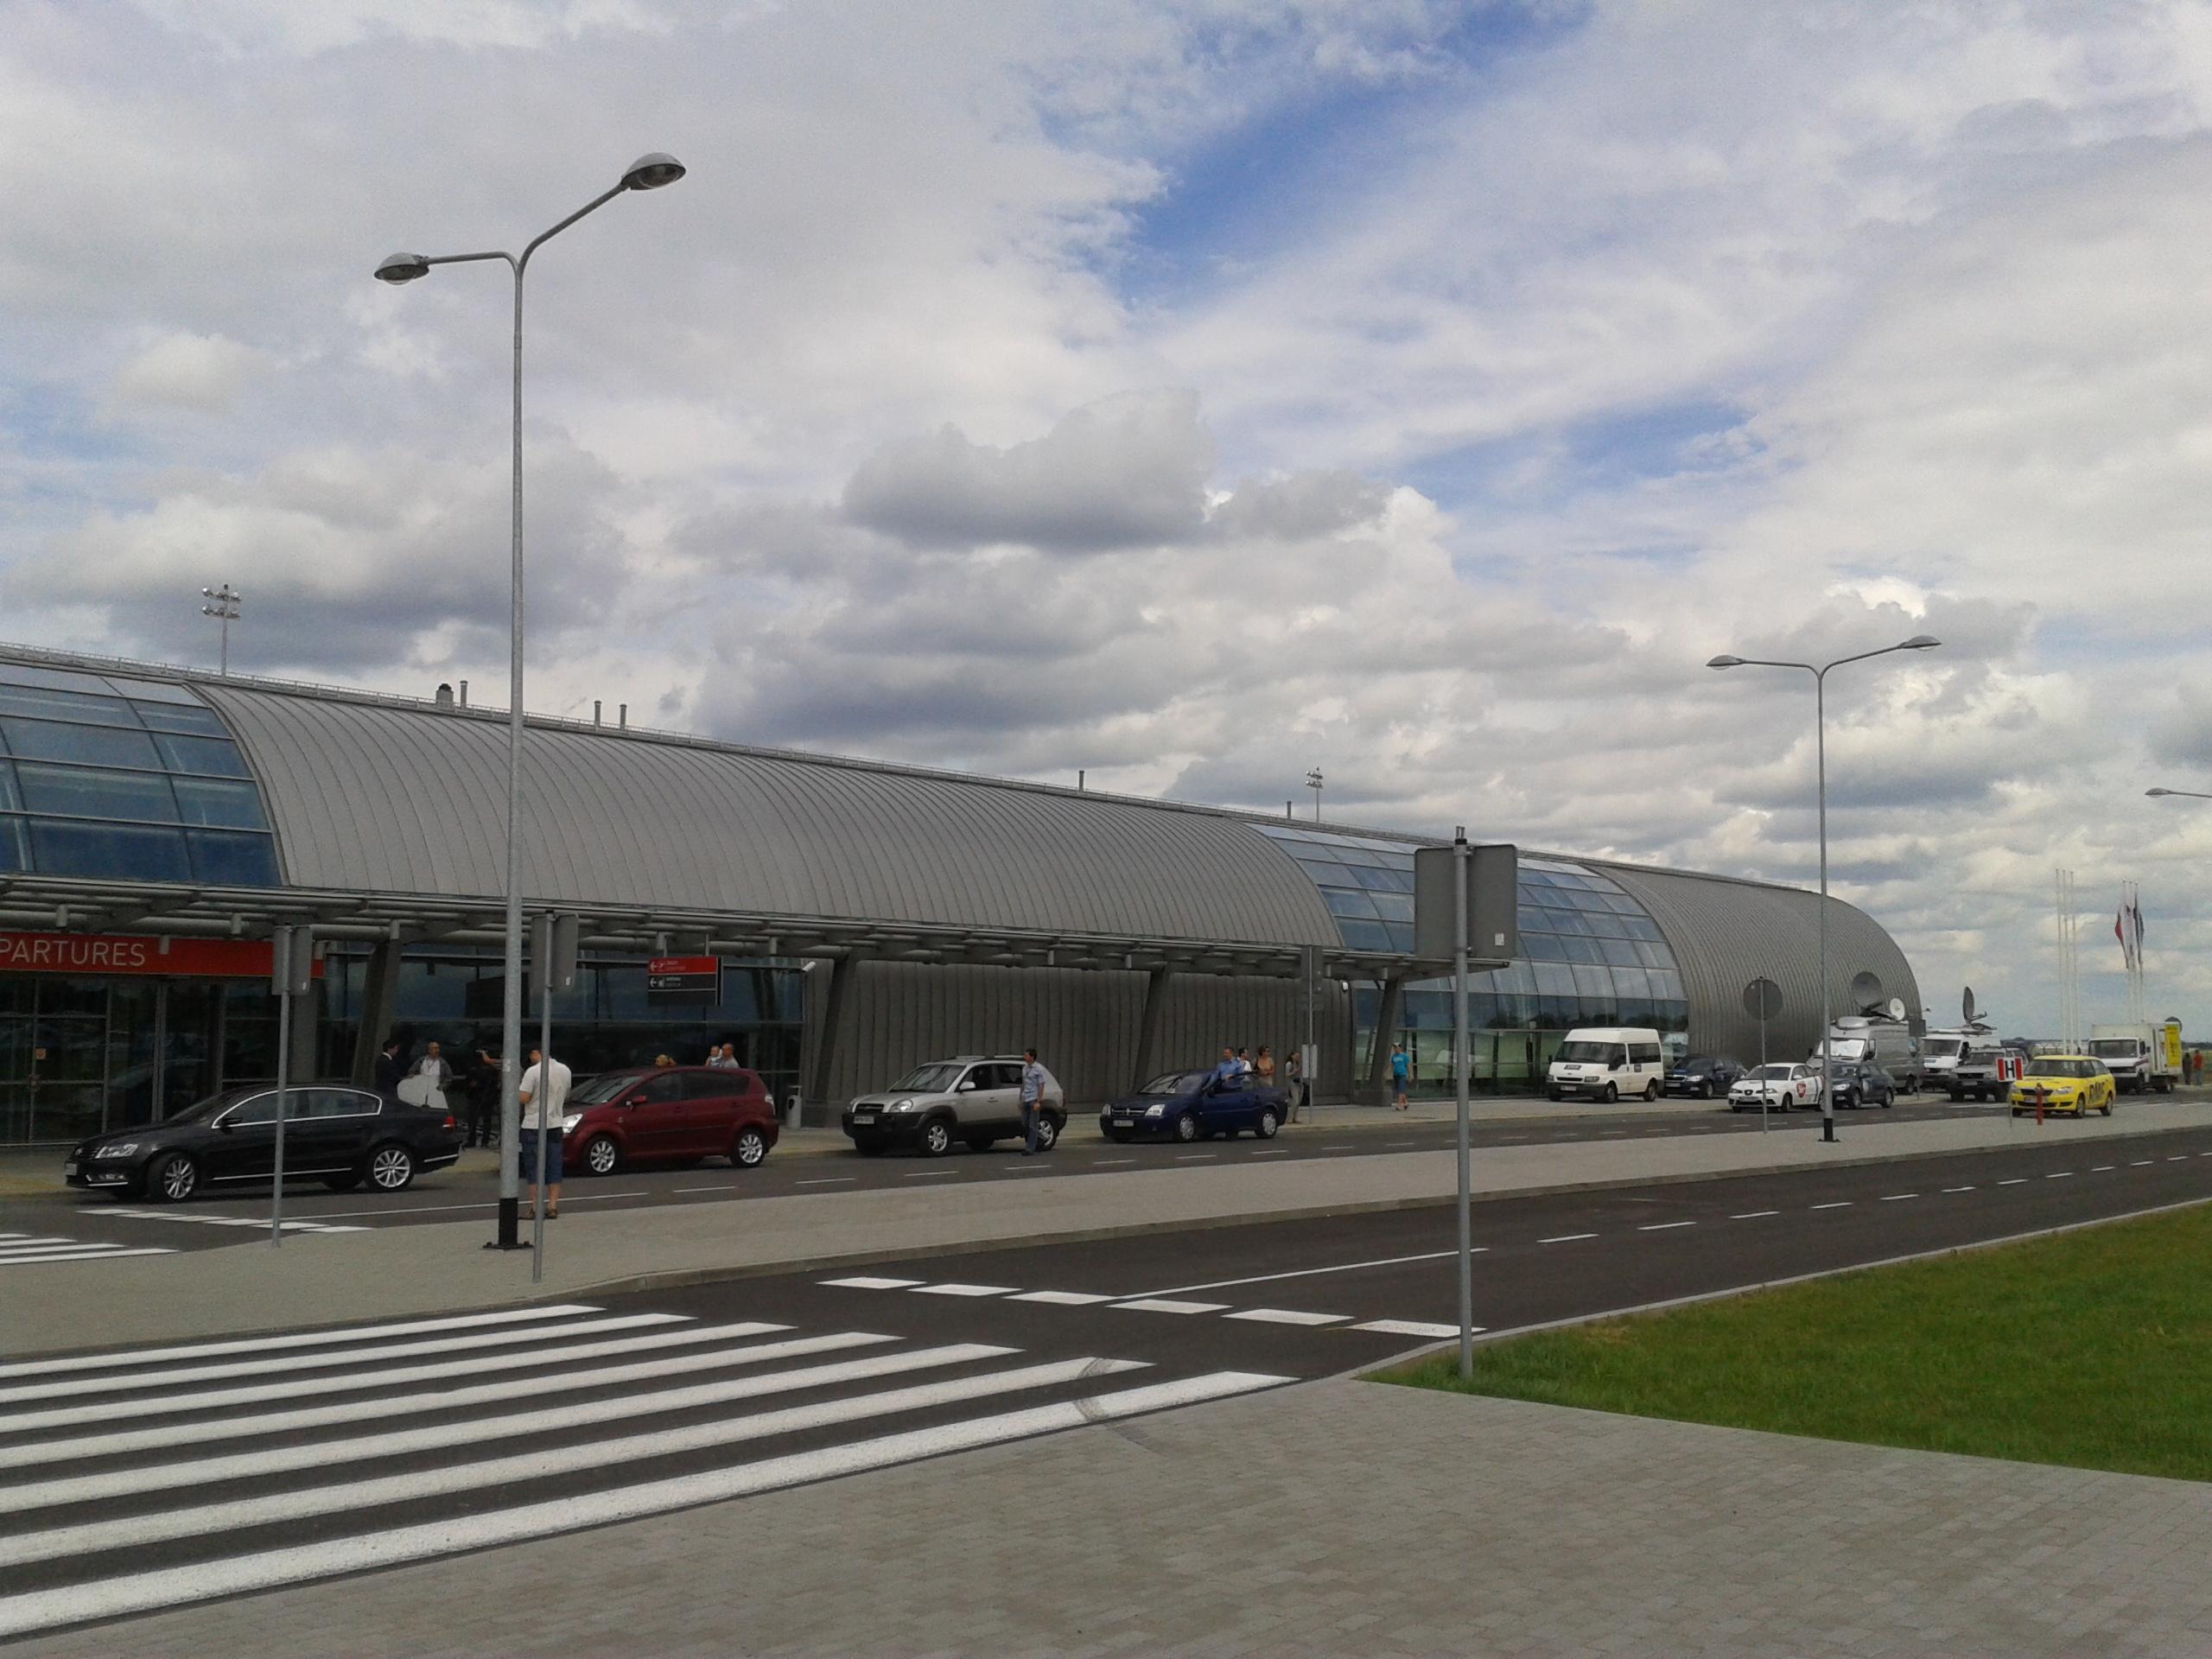 Flughafen Modlin, Foto: Hubert Smietanka